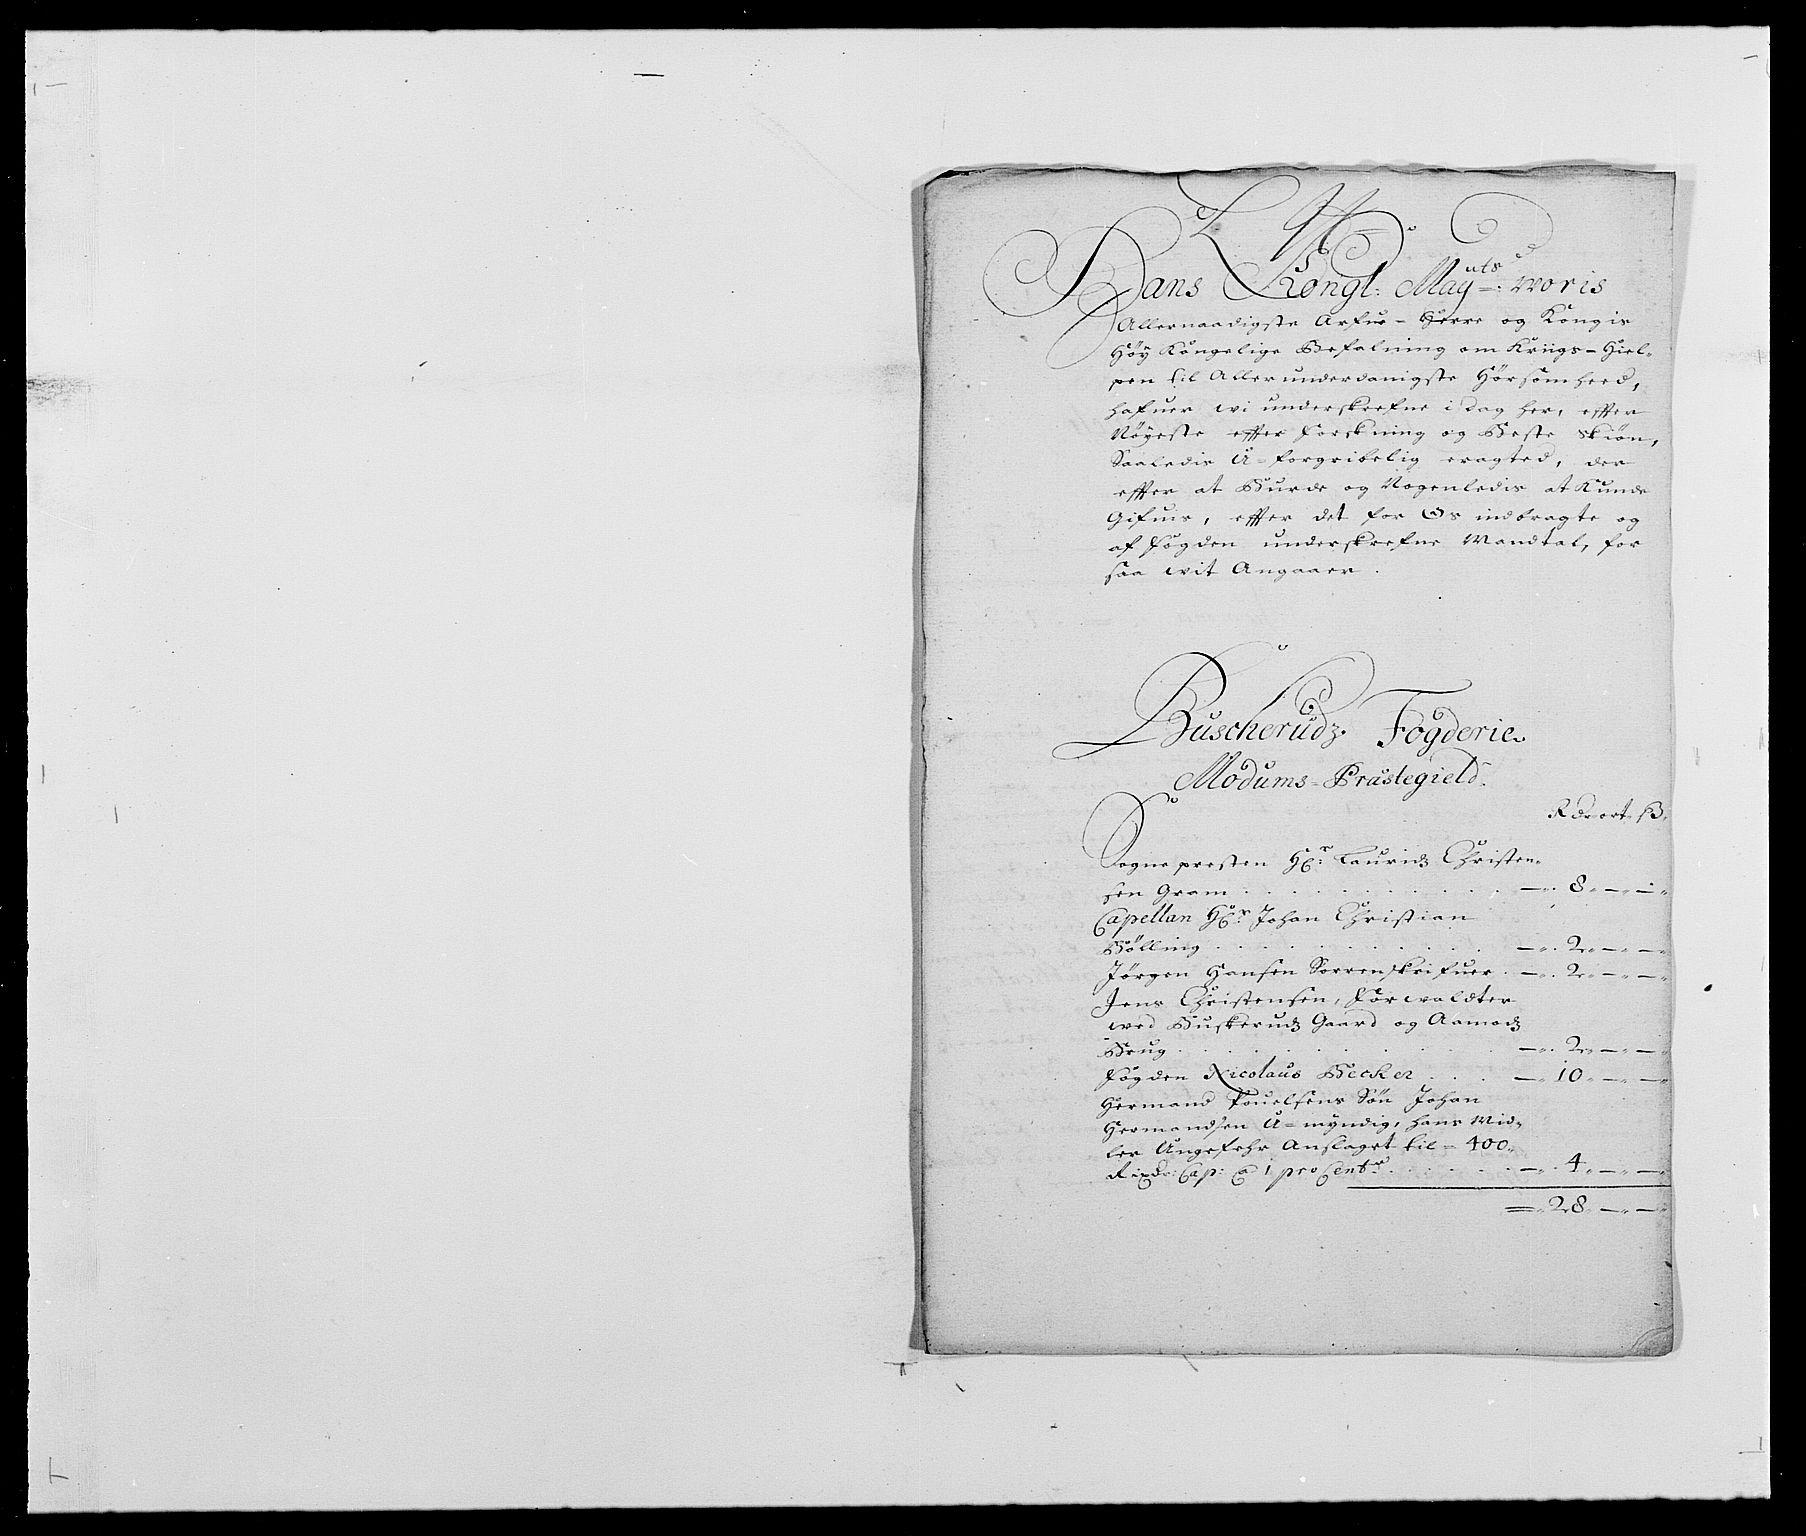 RA, Rentekammeret inntil 1814, Reviderte regnskaper, Fogderegnskap, R25/L1677: Fogderegnskap Buskerud, 1683-1684, s. 150